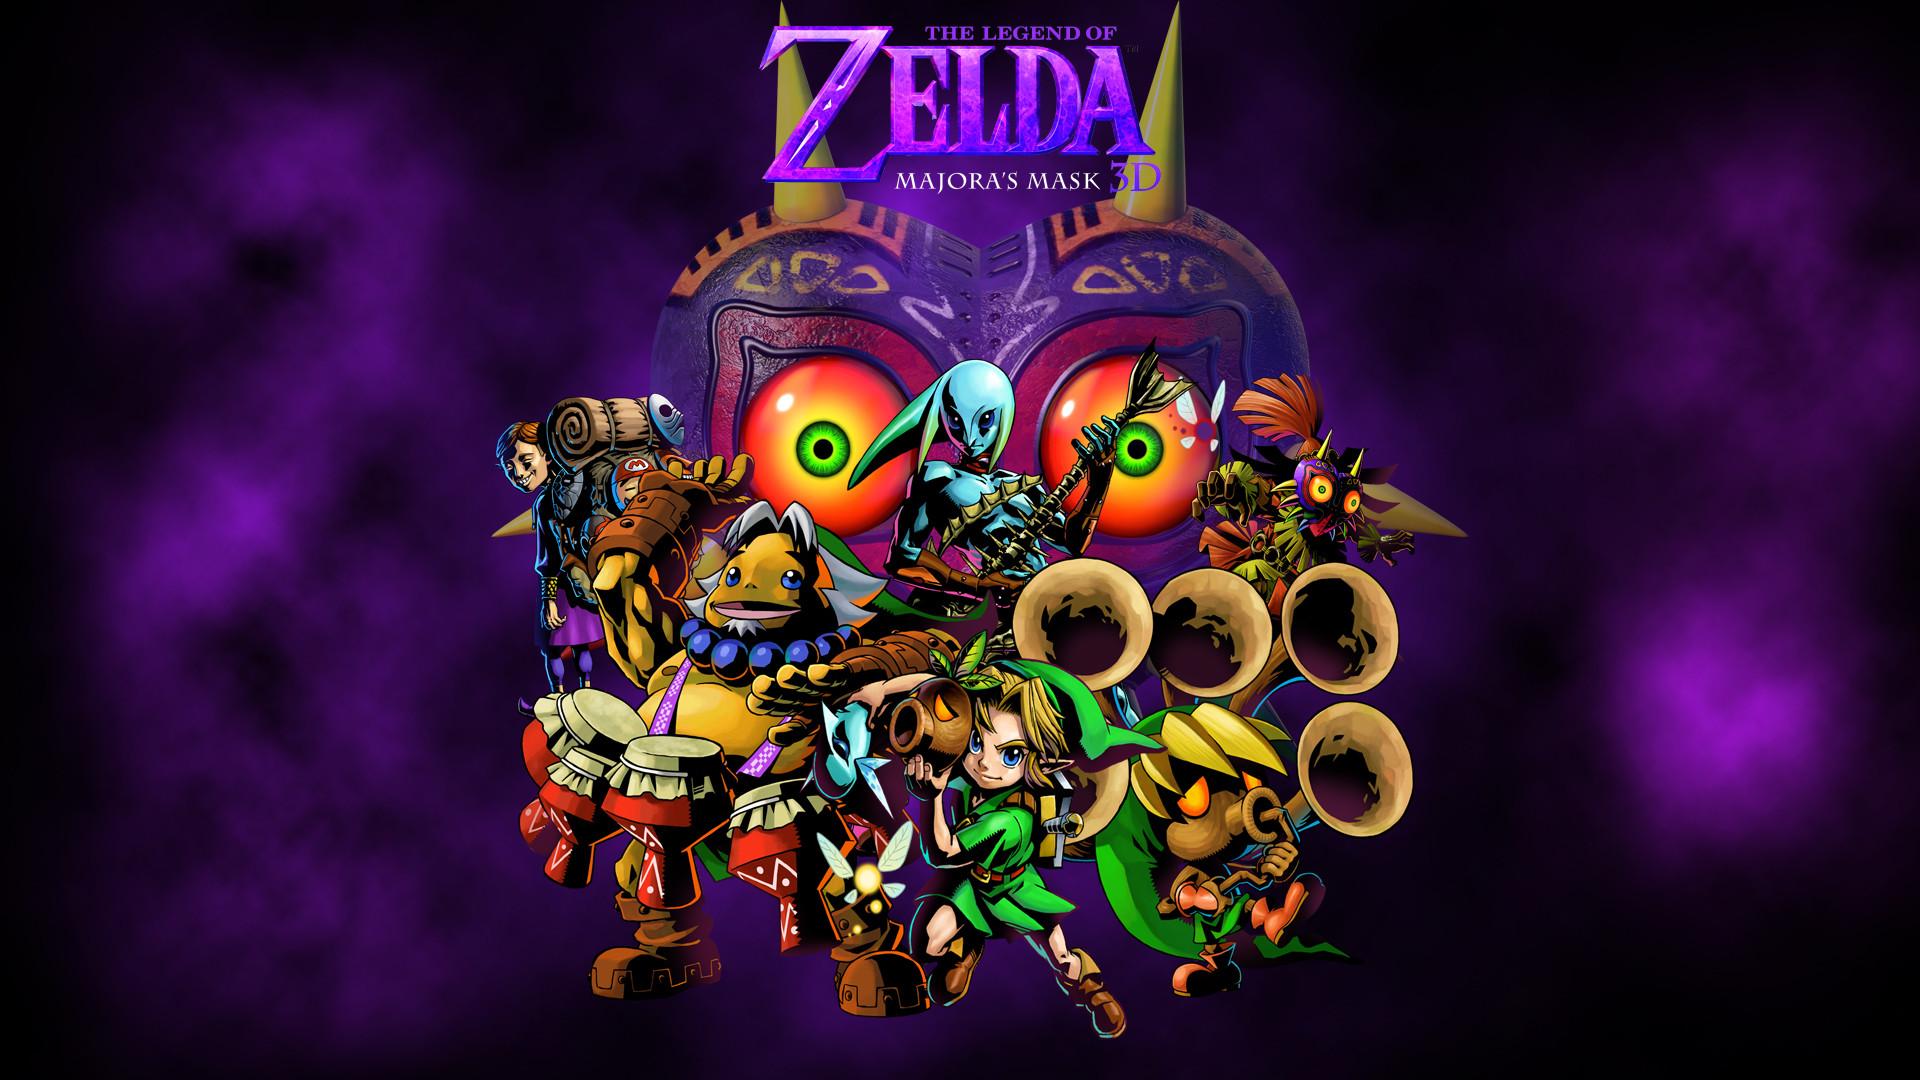 … Zelda Majora's Mask 3ds wallpaper by zupertompa